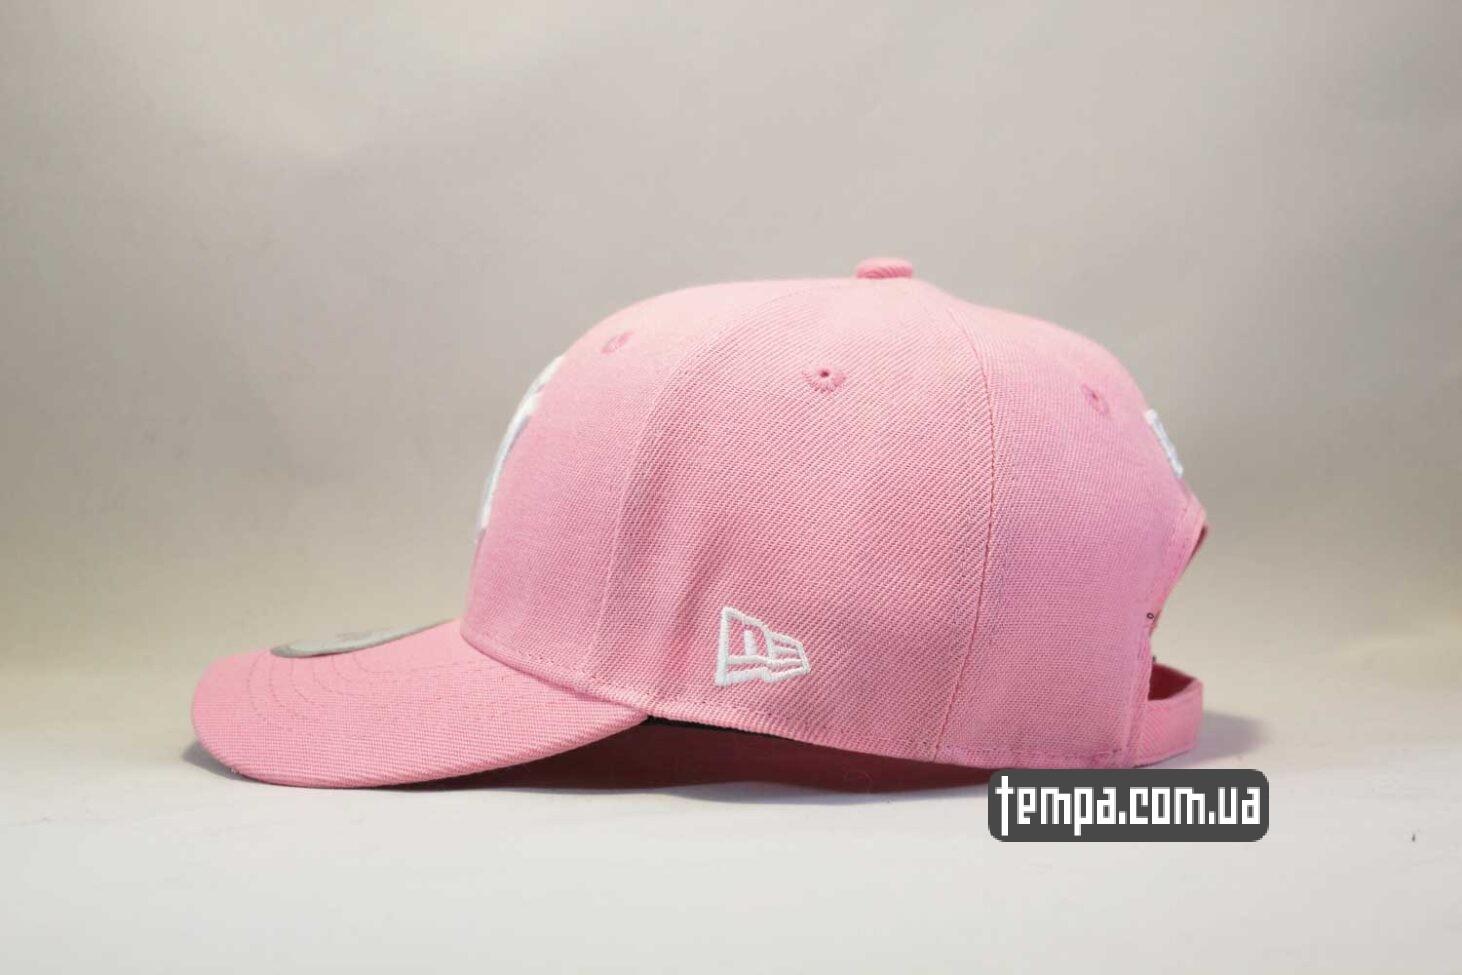 newera ориниал Украина купить кепка бейсболка New Era Yankees Pink розовая бейсболка